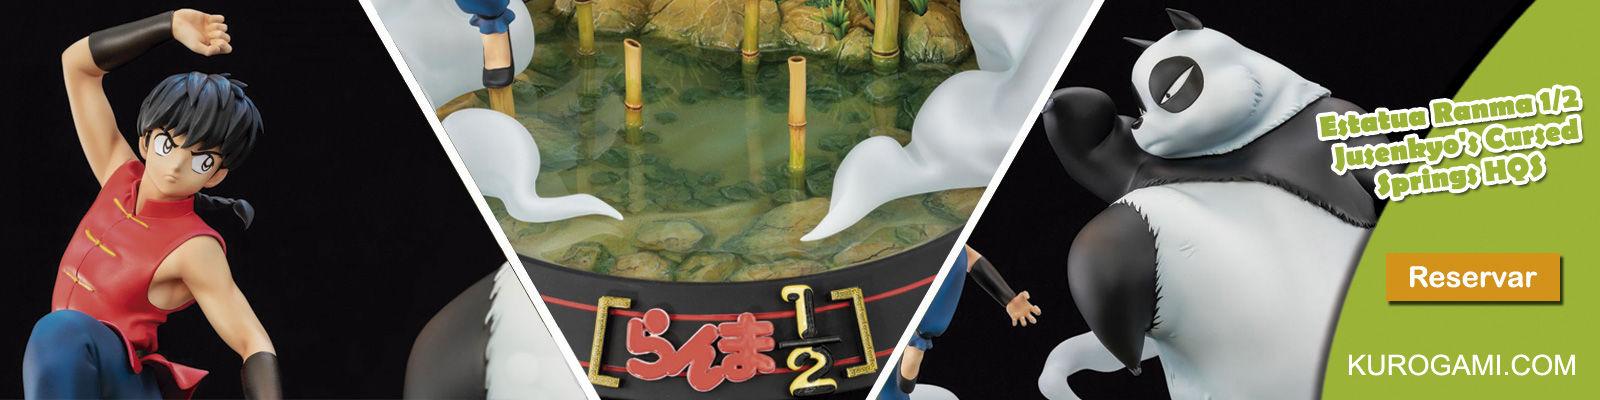 Estatua_Ranma_1/2_Jusenkyo's_Cursed_Springs_HQS